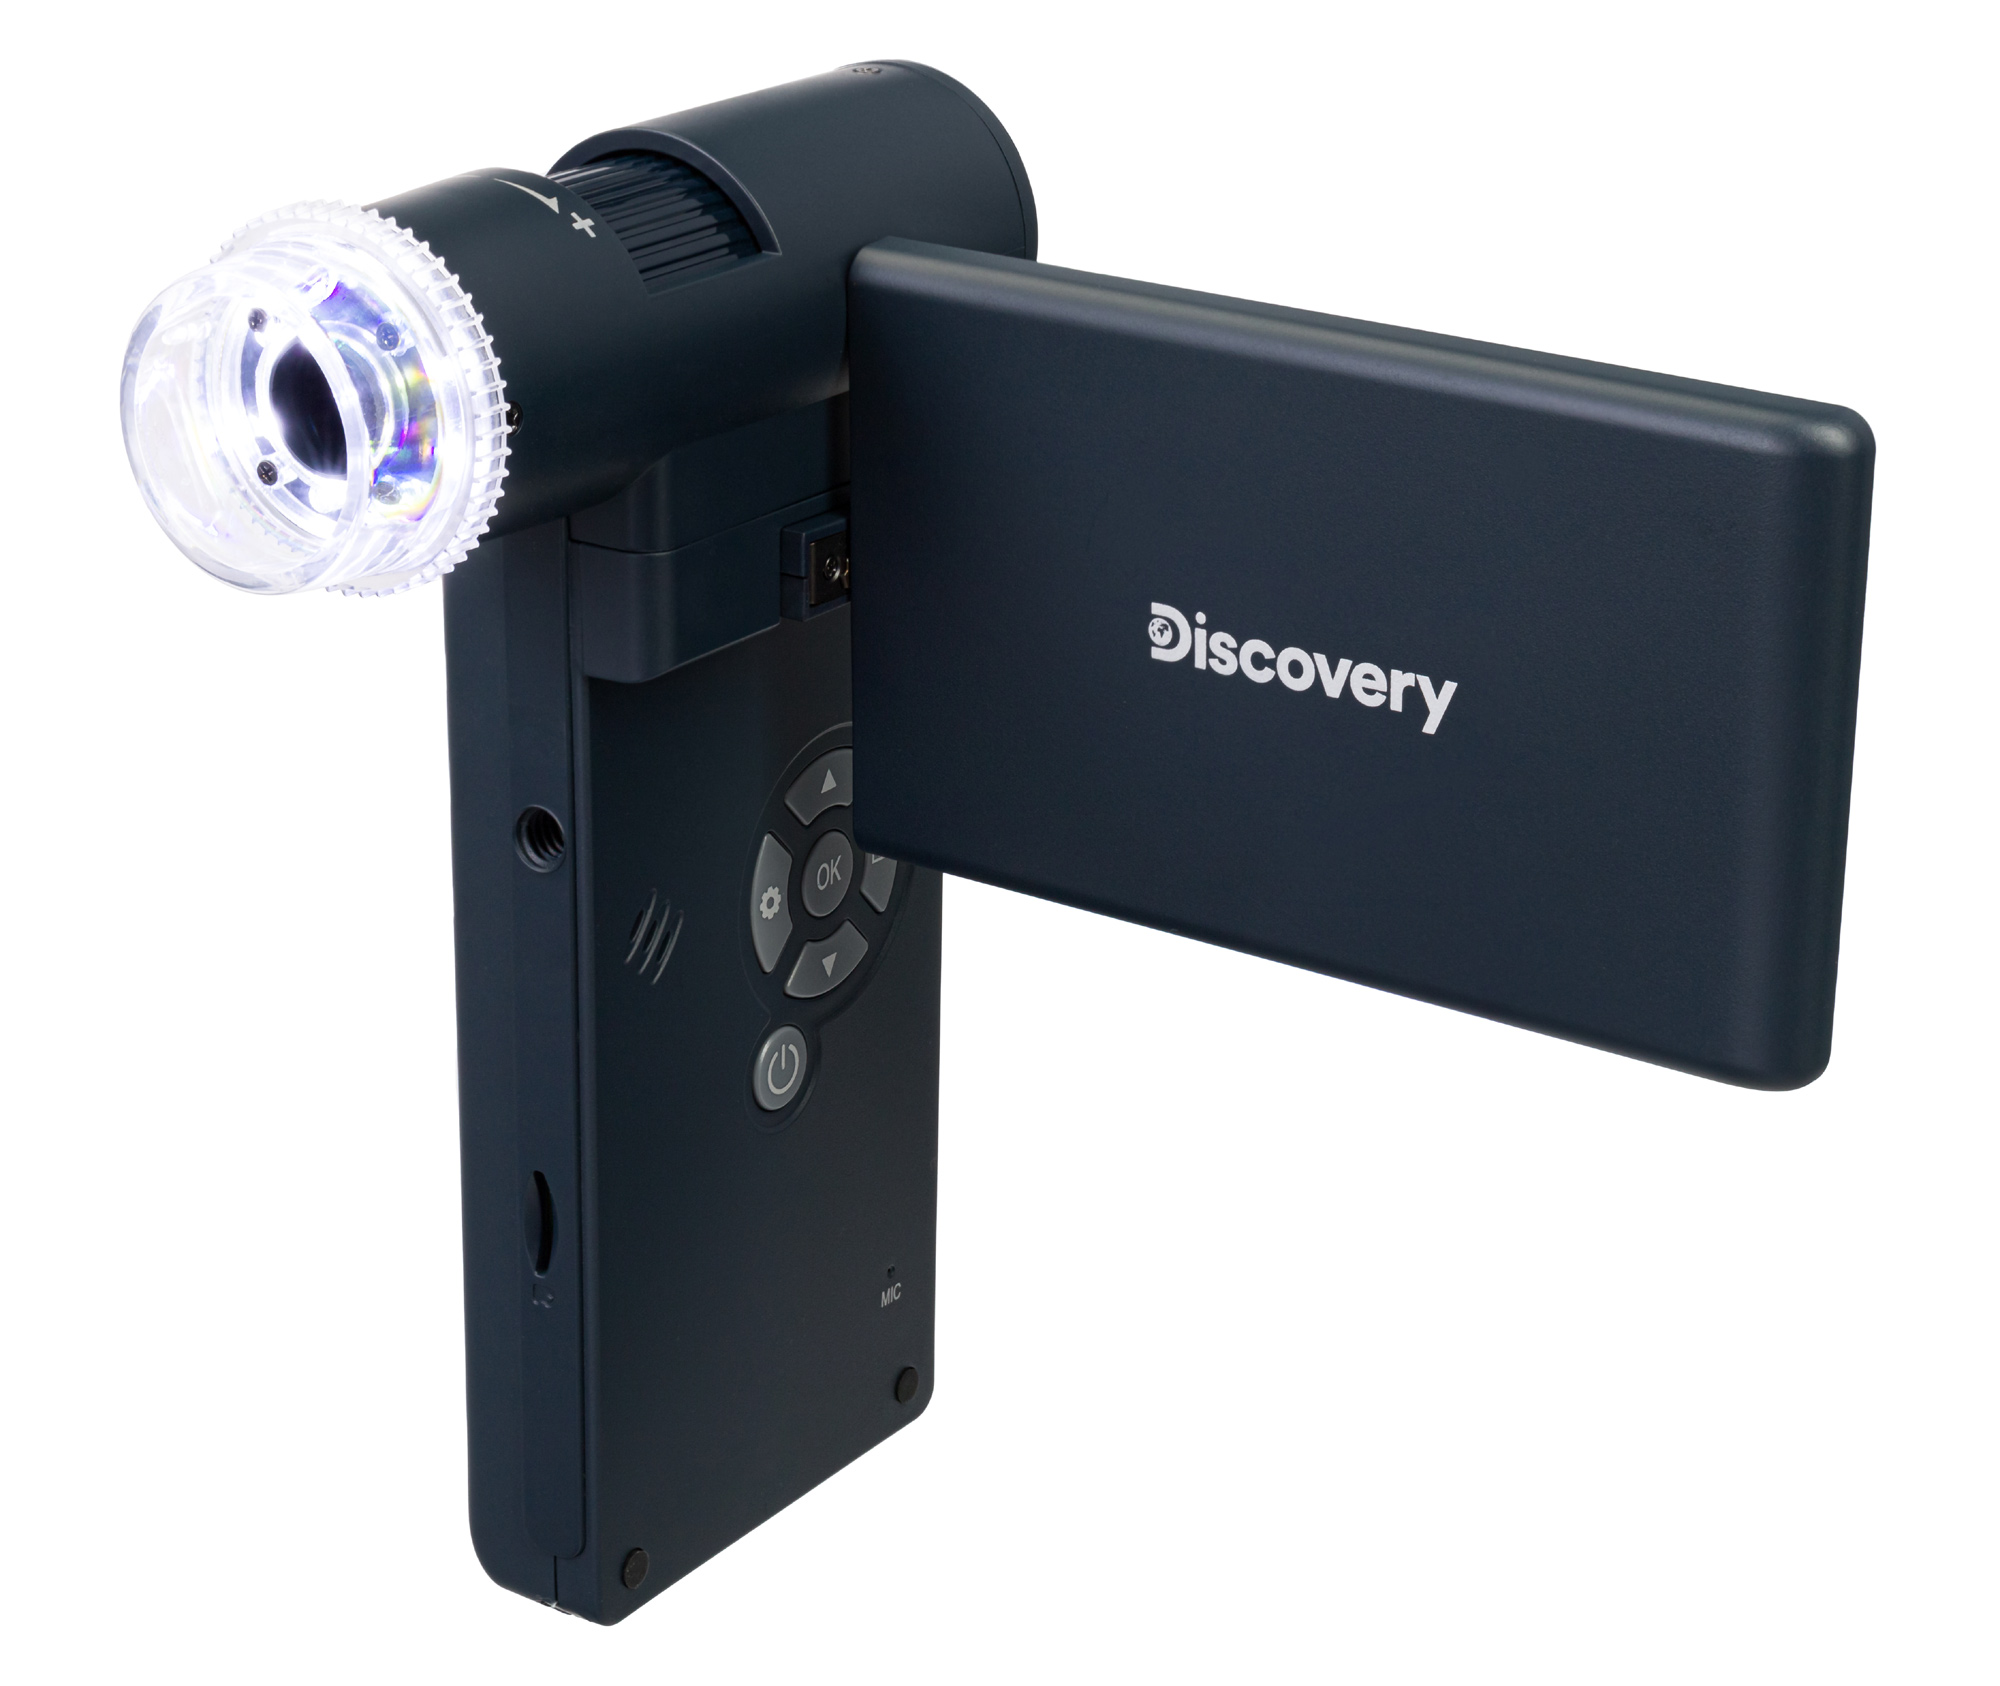 Картинка для Микроскоп цифровой Discovery Artisan 1024